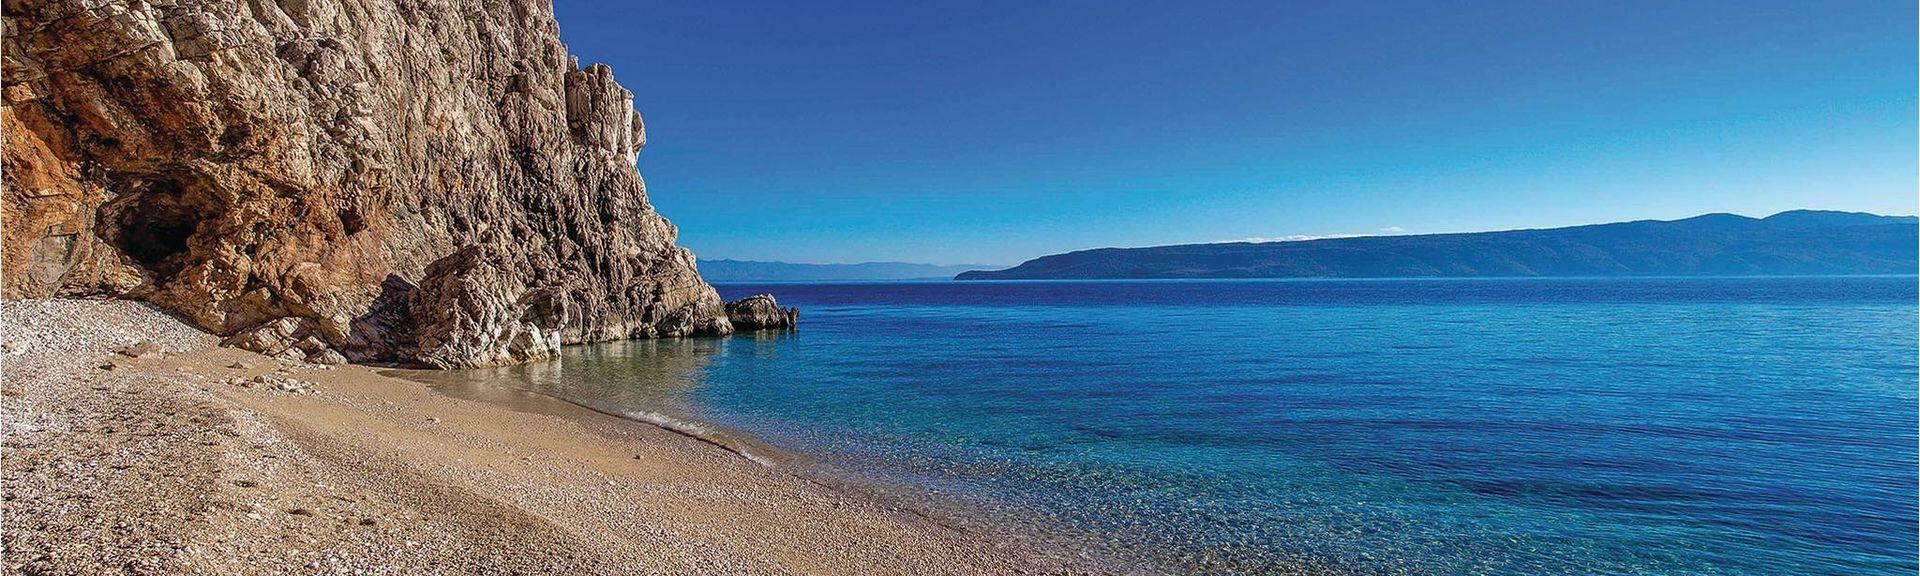 Krsan, Istrië (provincie), Kroatië